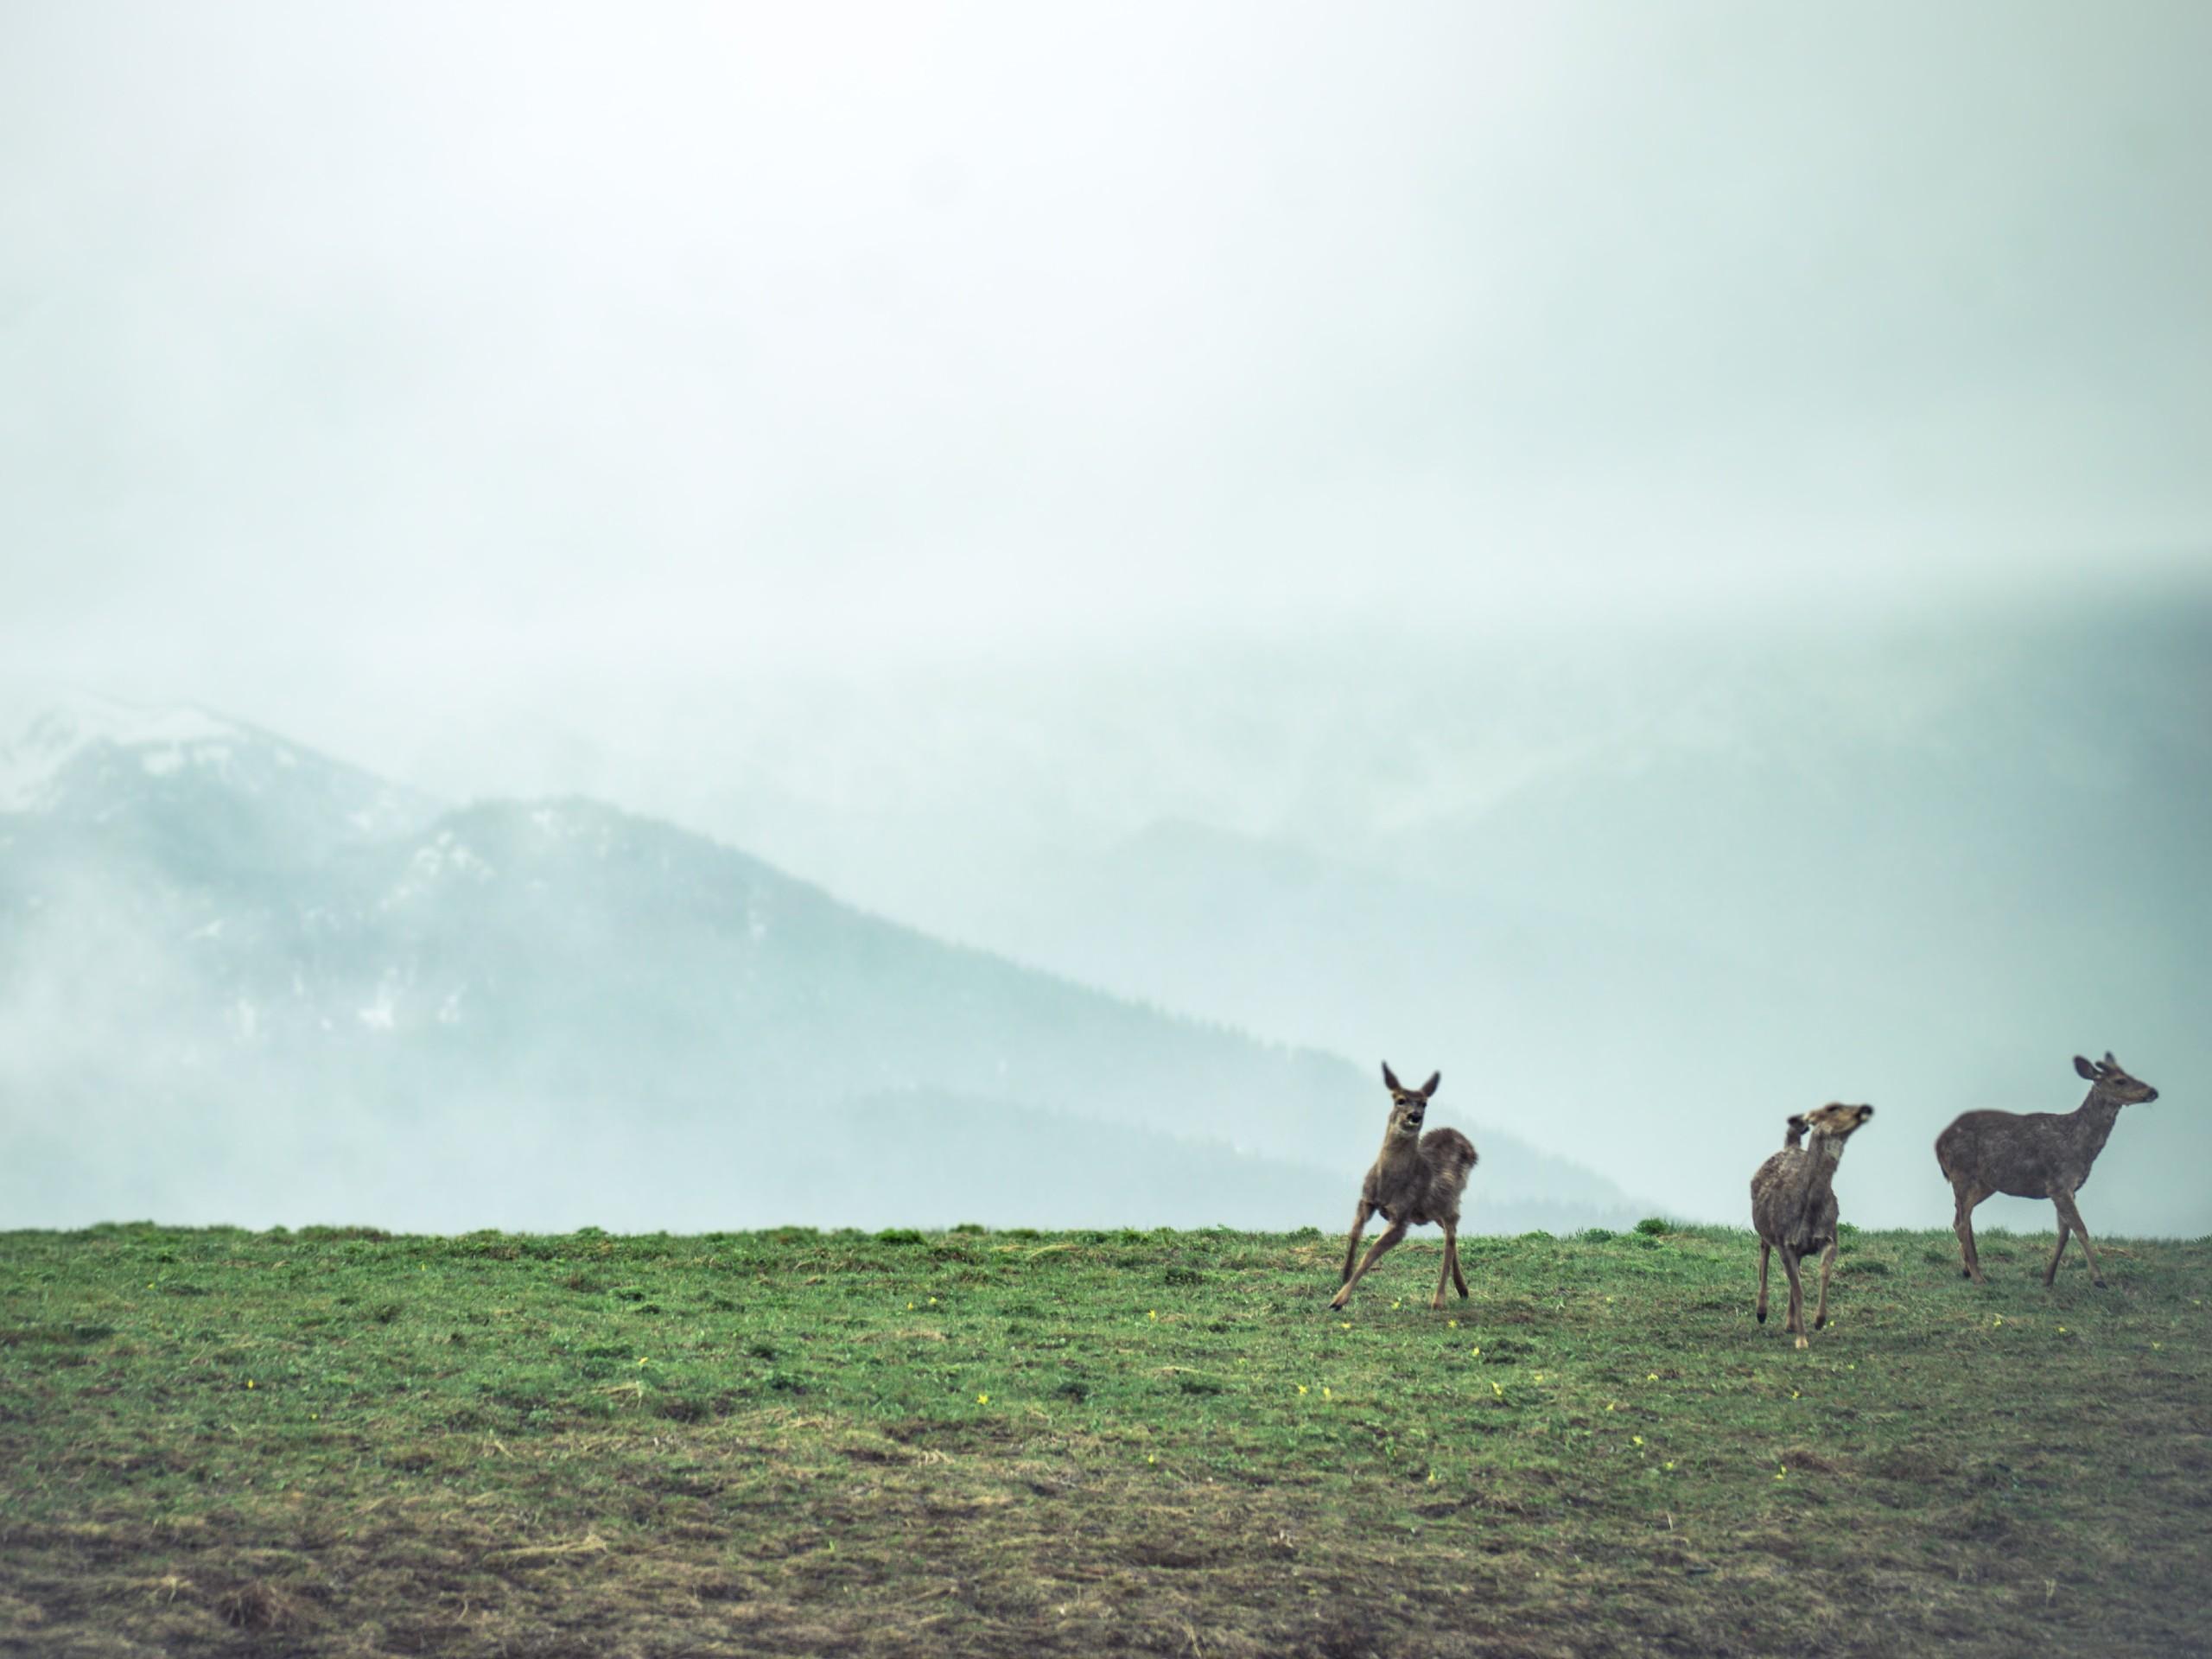 Three deer Port Angeles (olympic national park)